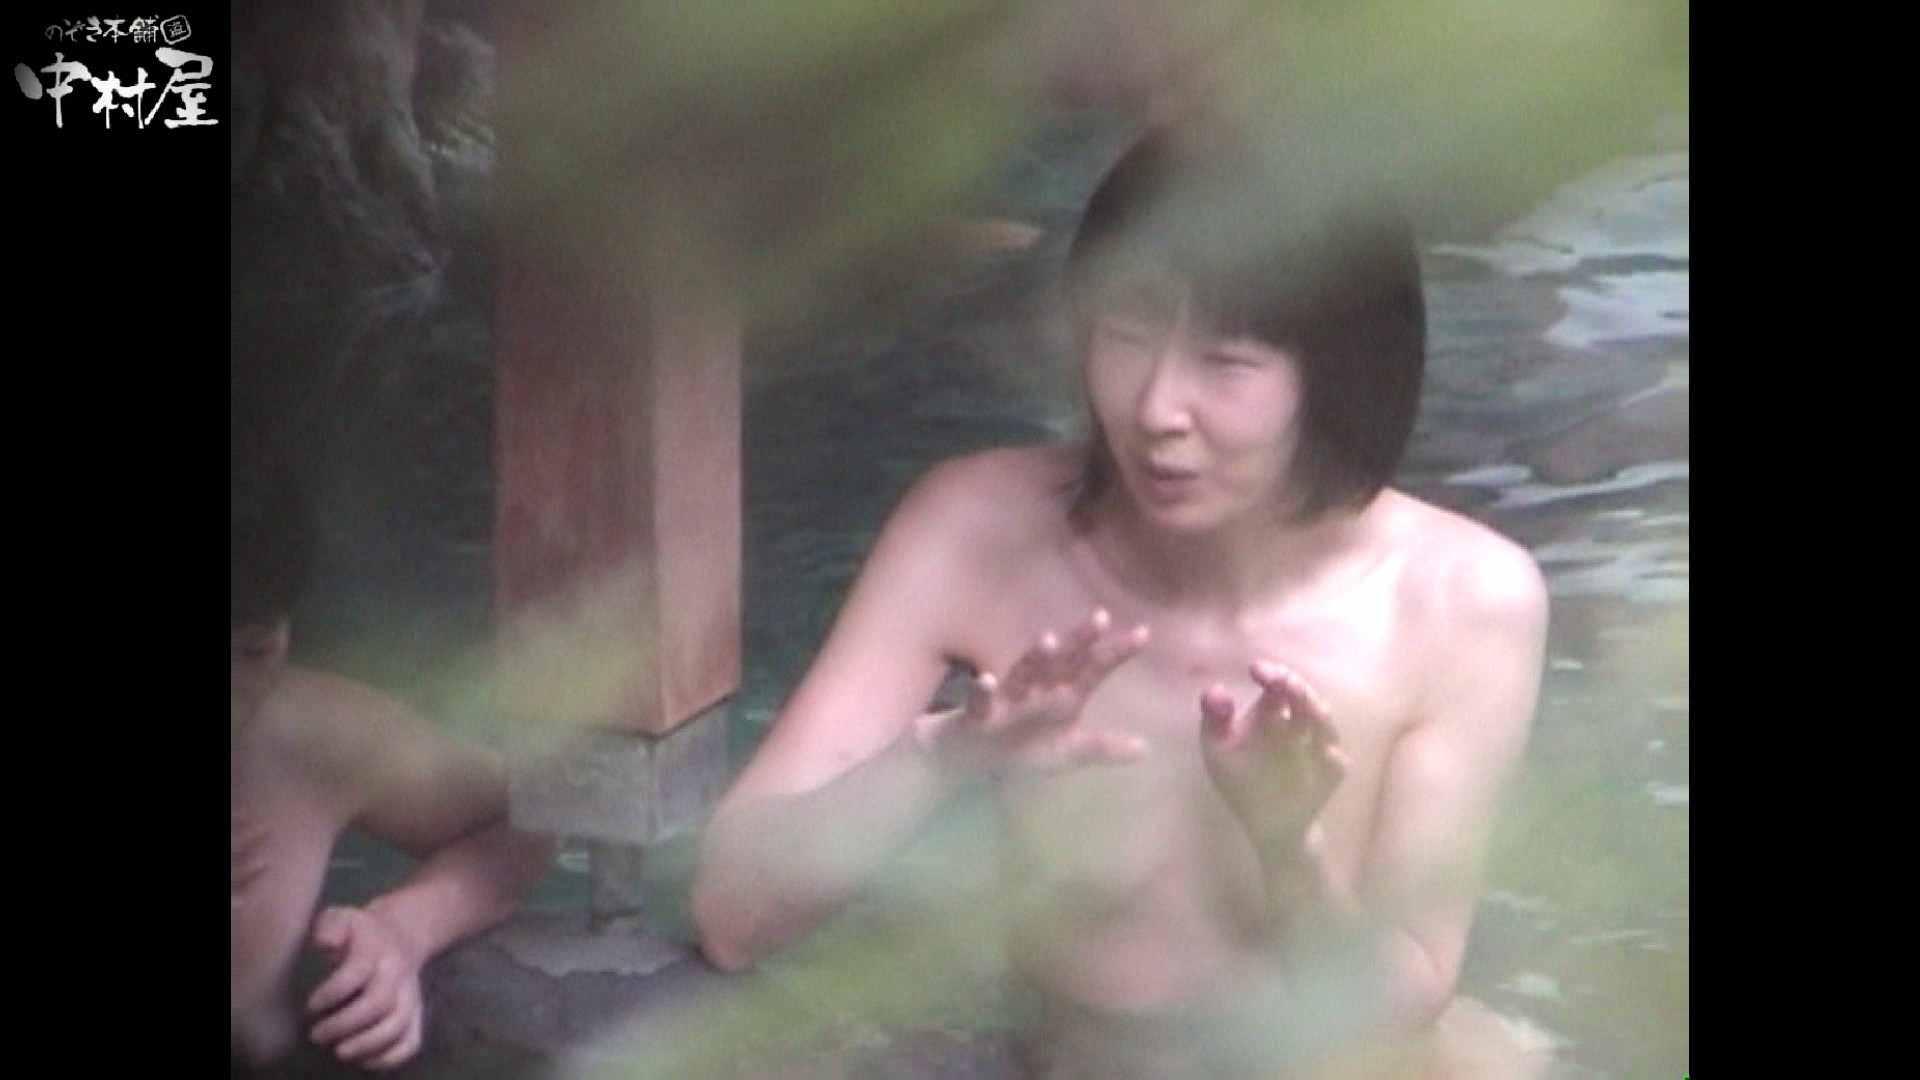 Aquaな露天風呂Vol.953 盗撮特撮  11pic 3